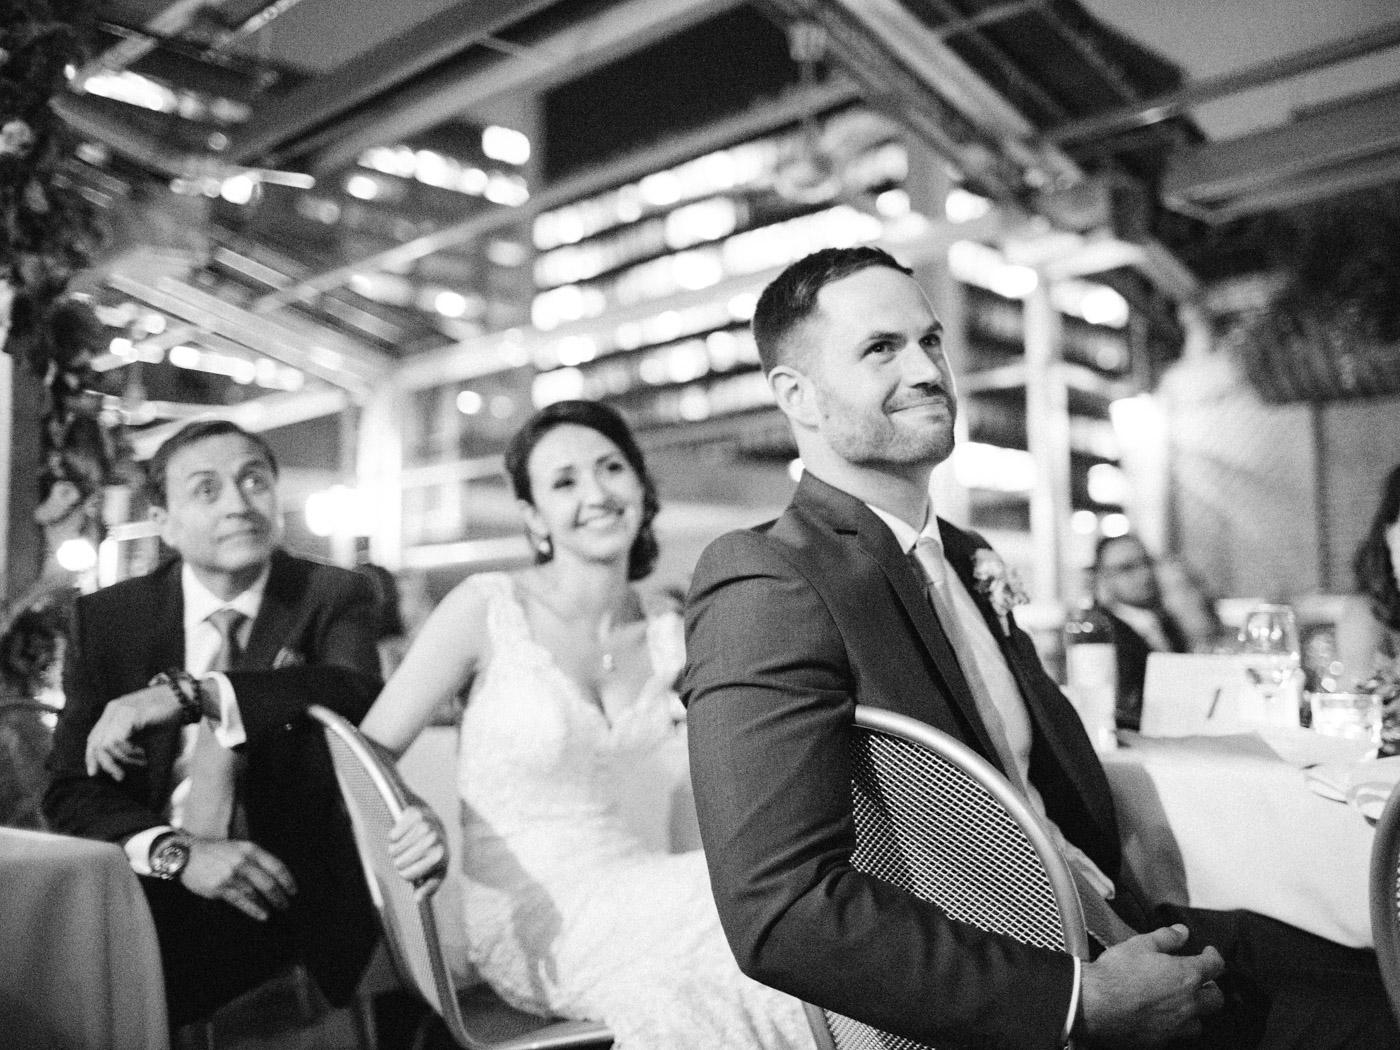 toronto_wedding_photographer_fine_art_documentary-517.jpg